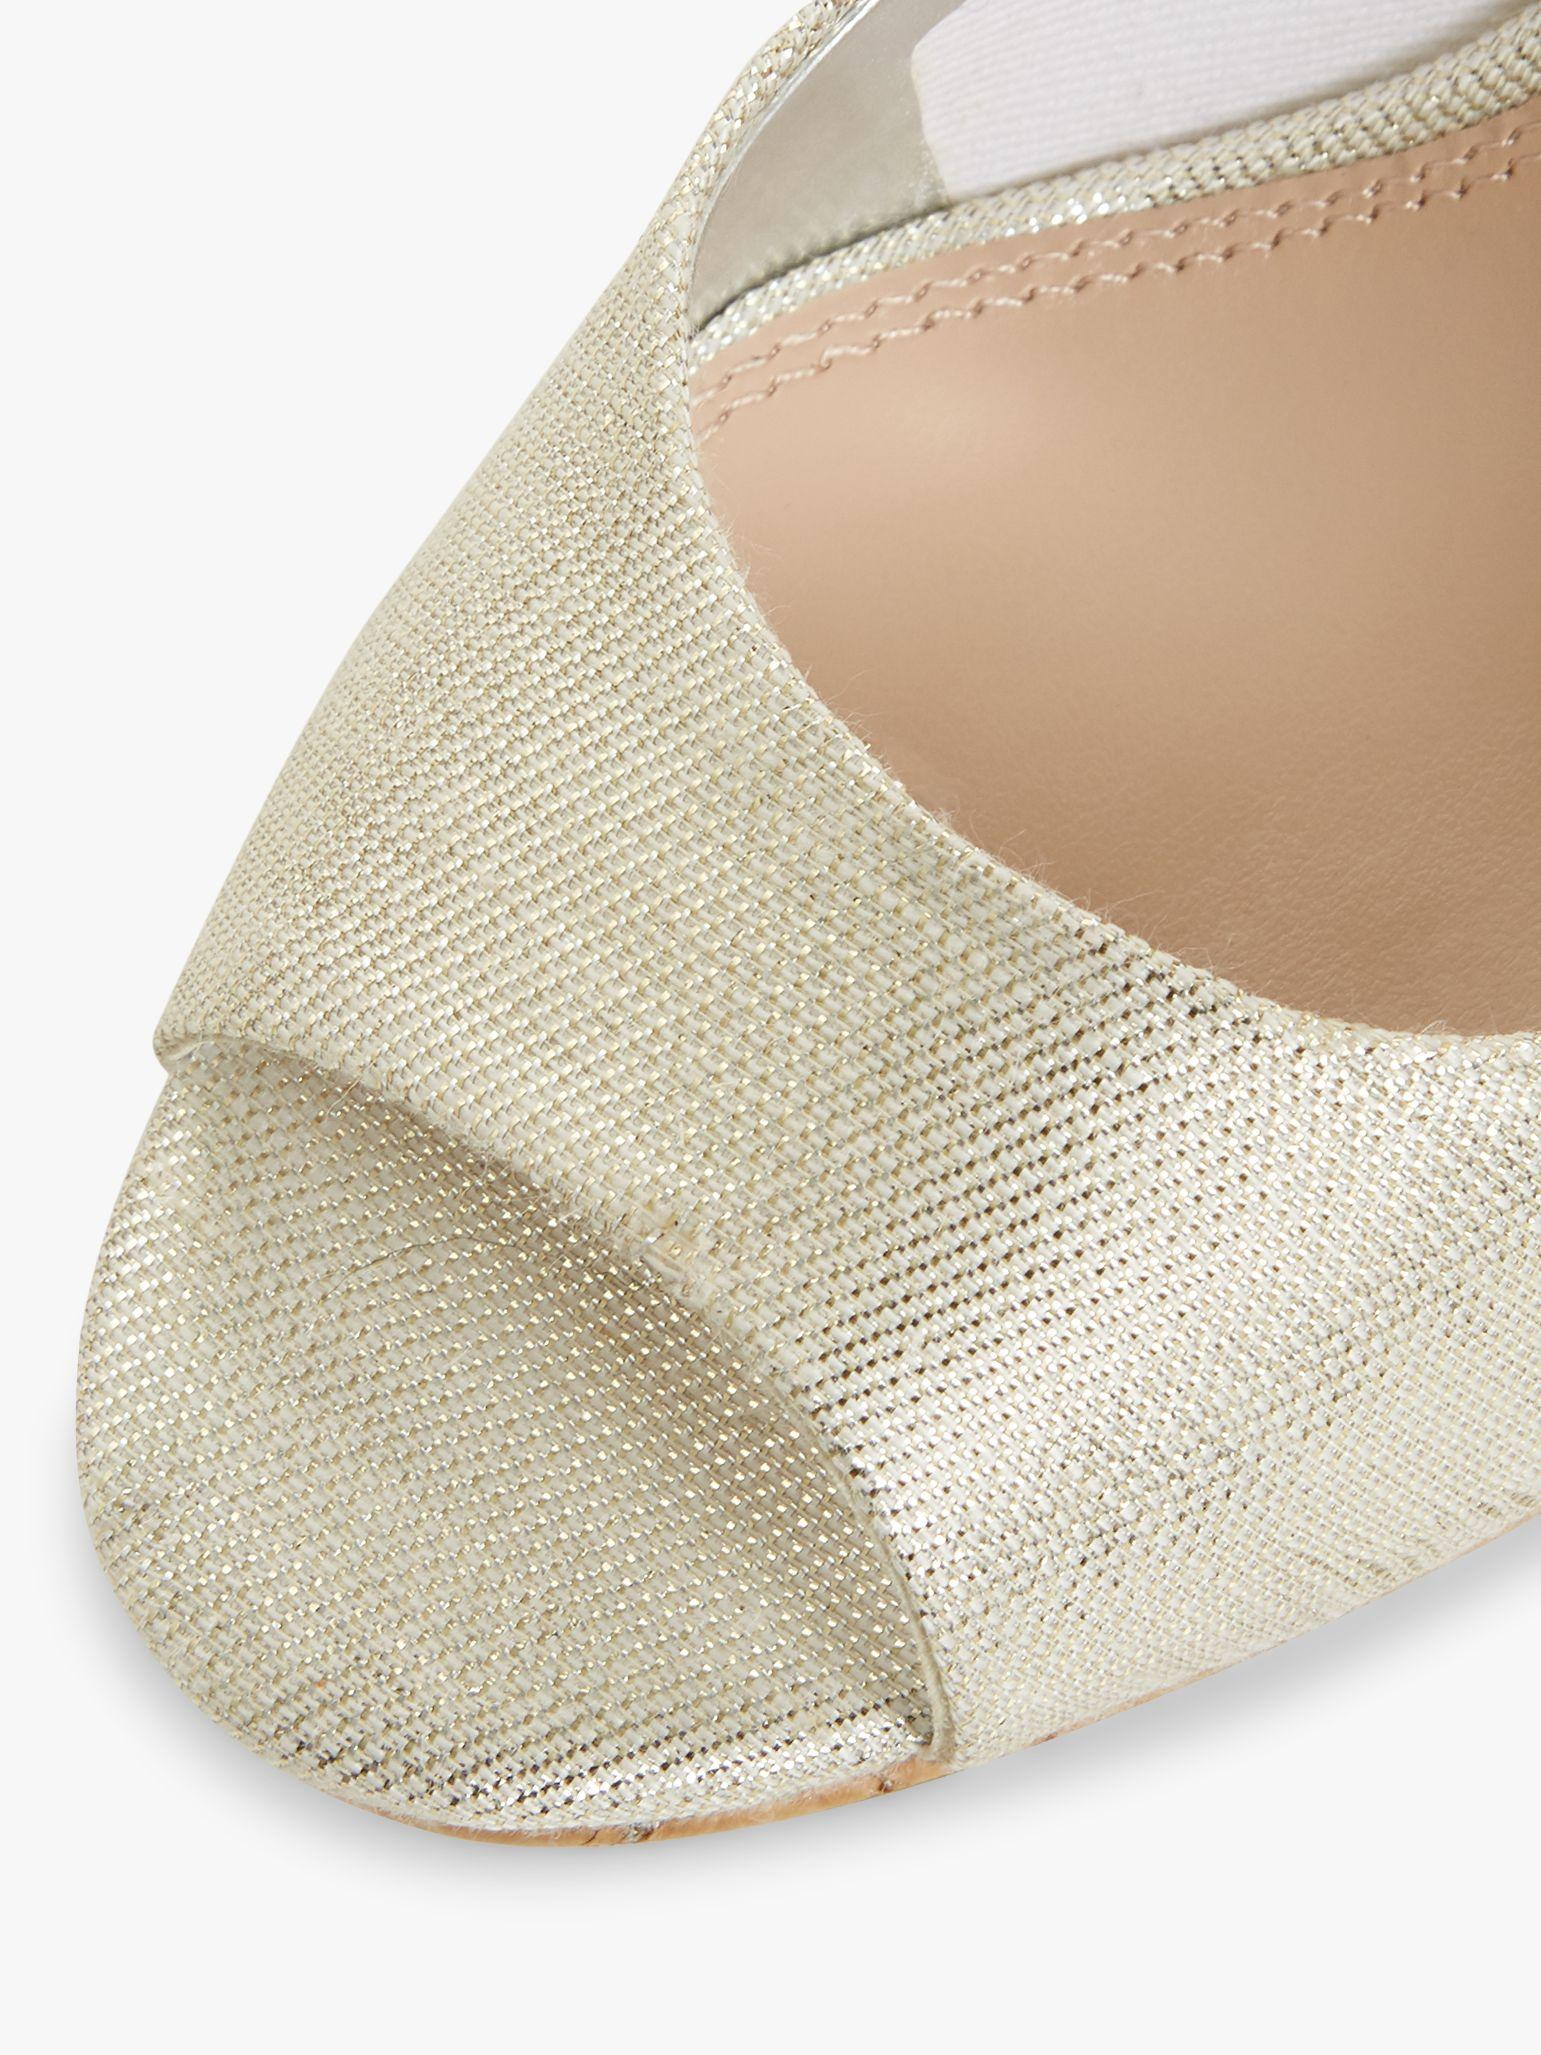 Women's Caydence Peep Toe Cork Wedge Court Shoes